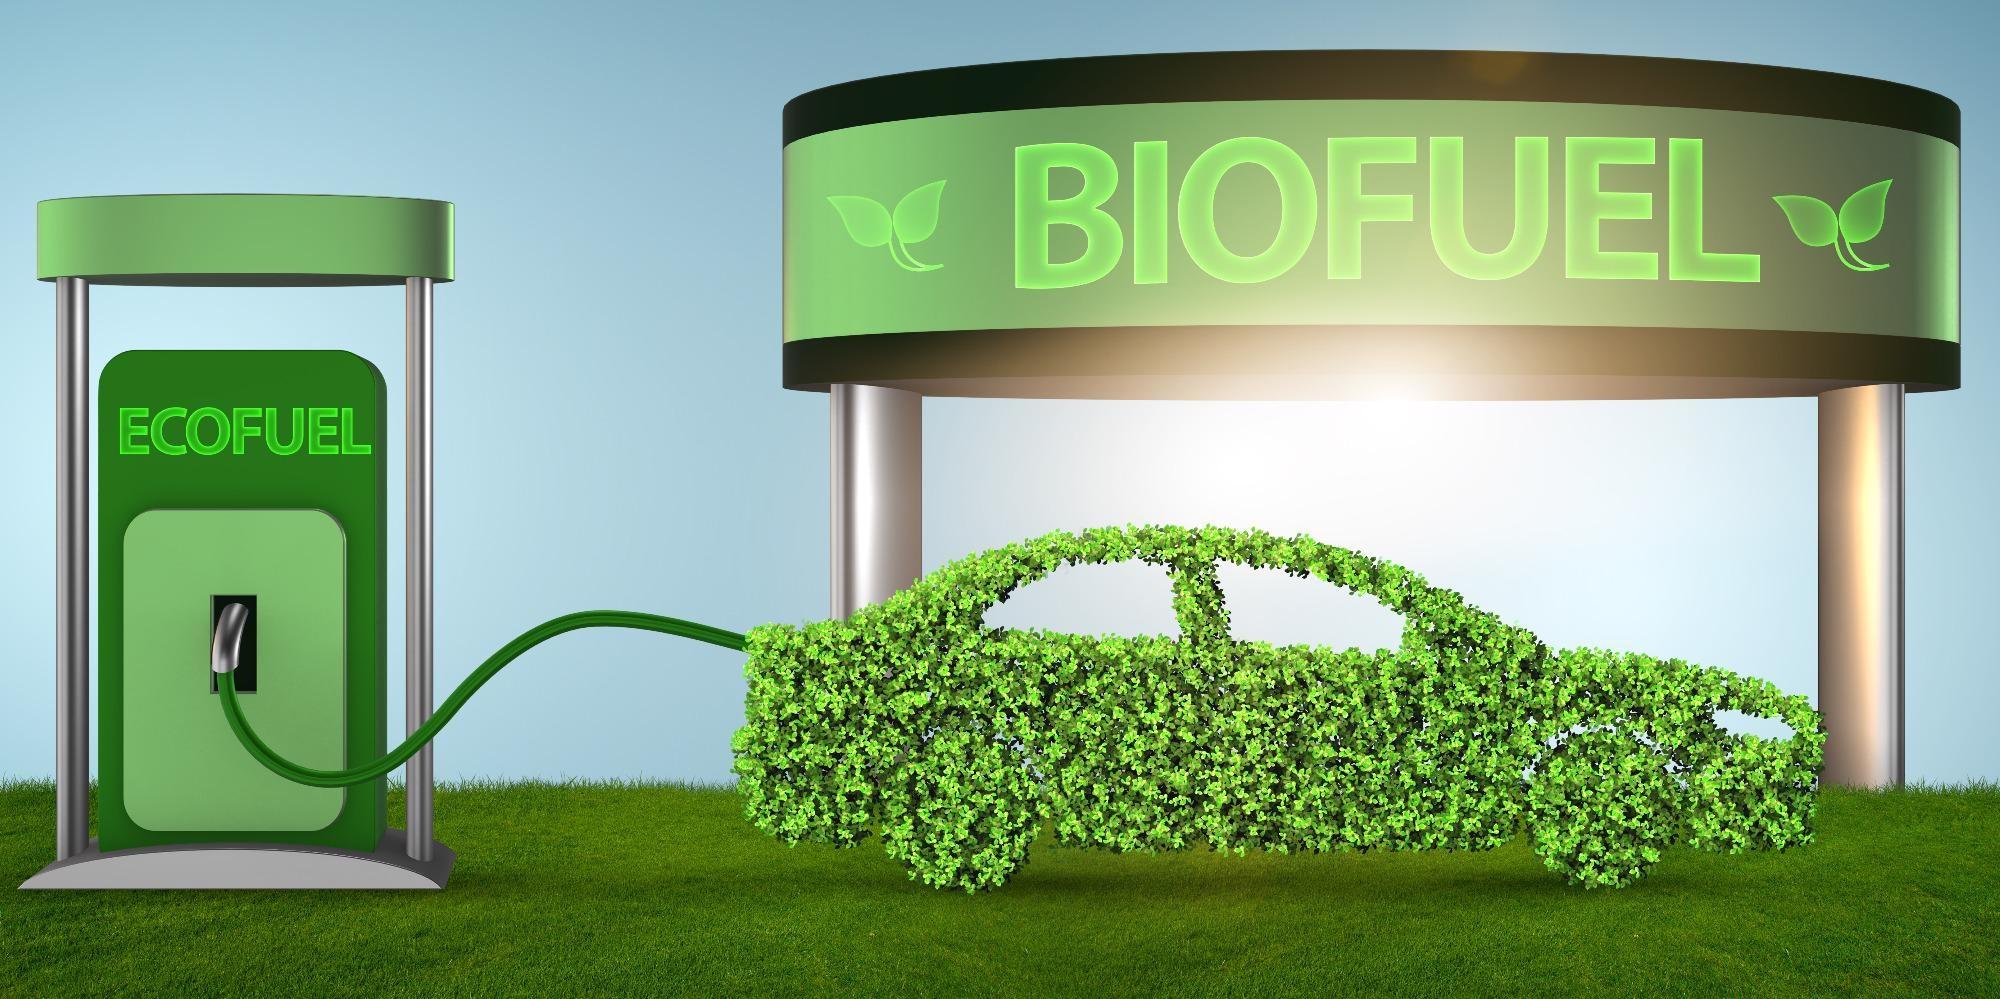 Radiation Treatment to Convert Organic Waste into Renewable Biofuel Additives.